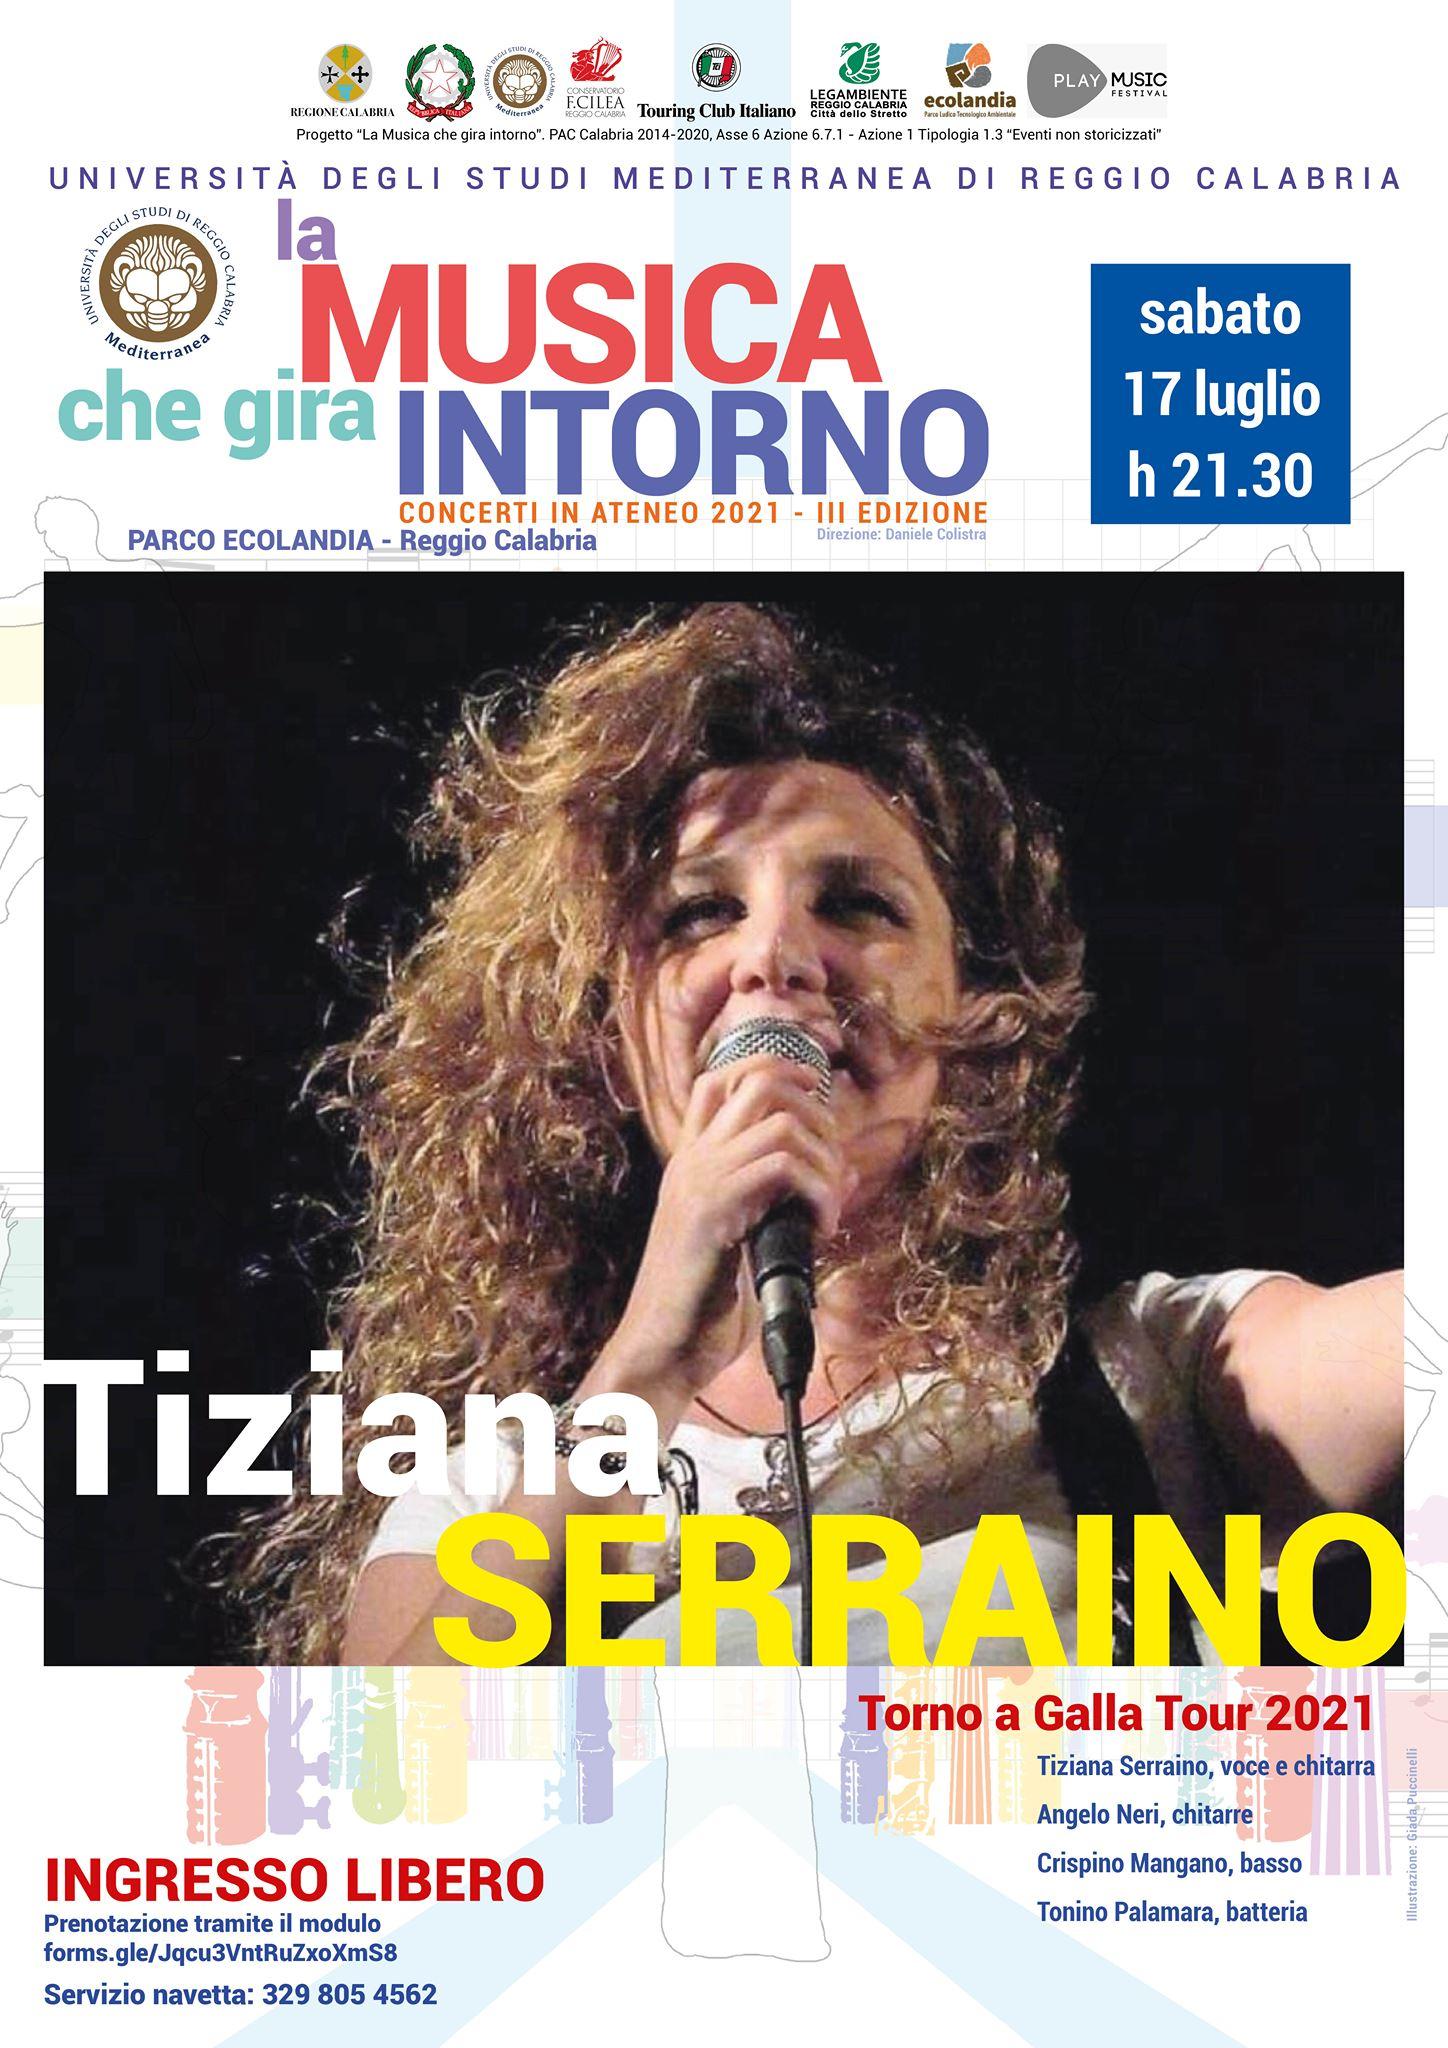 Tiziana Serraino